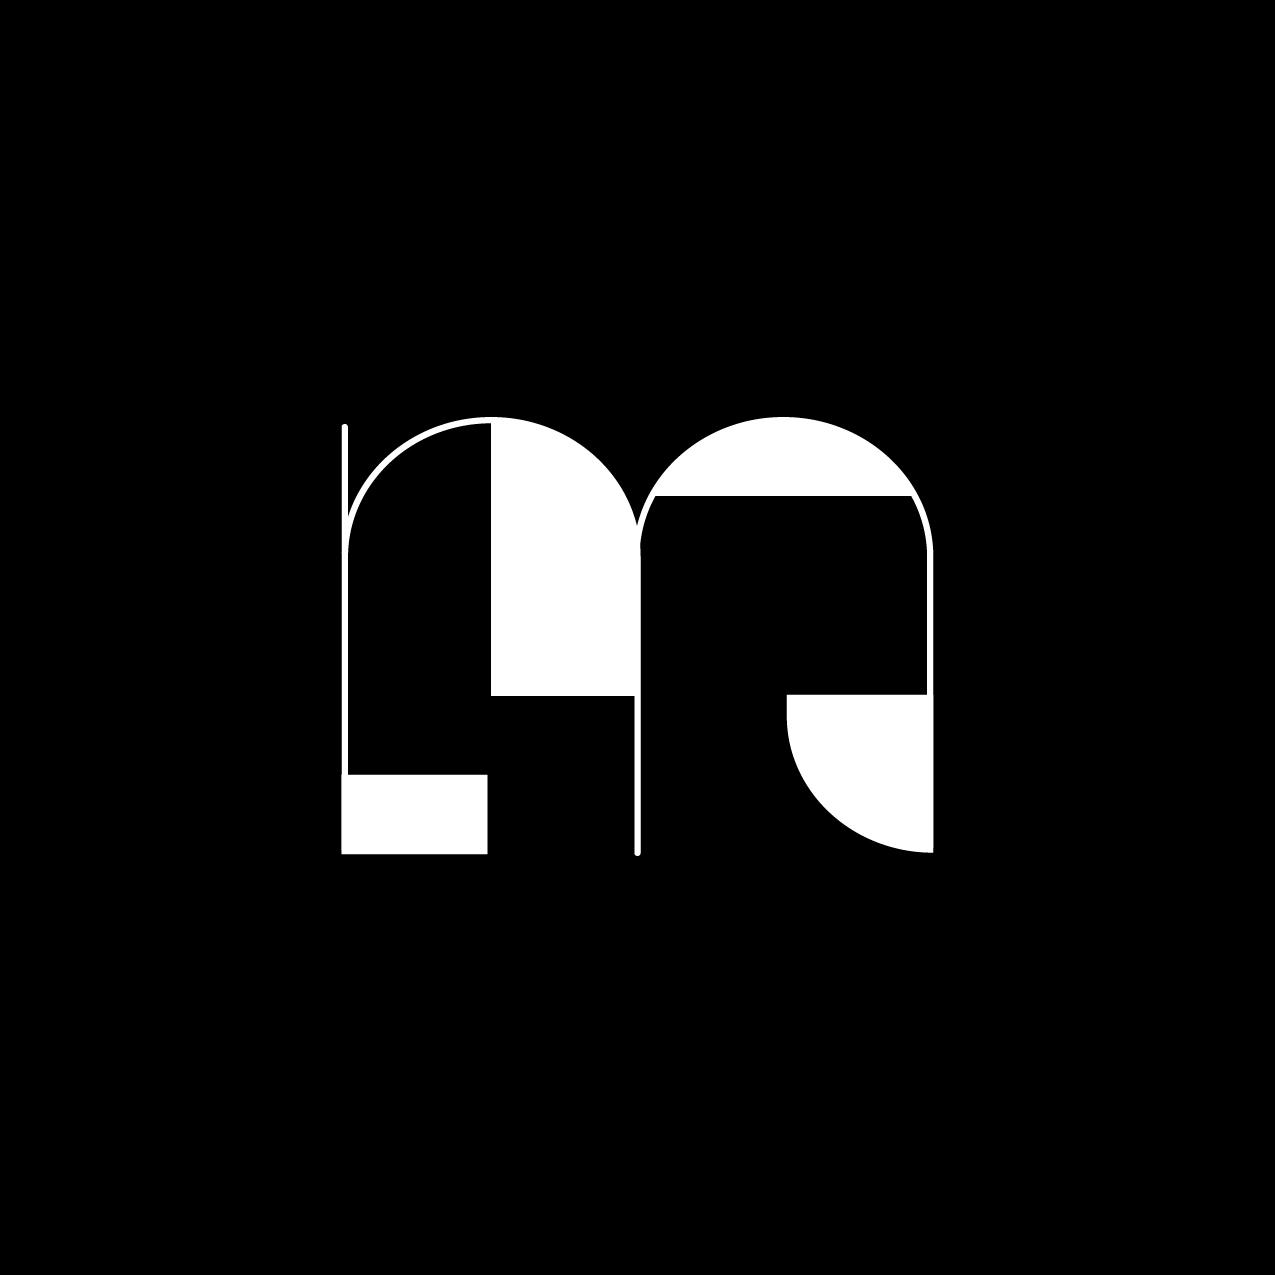 Letter M14 Design by Furia